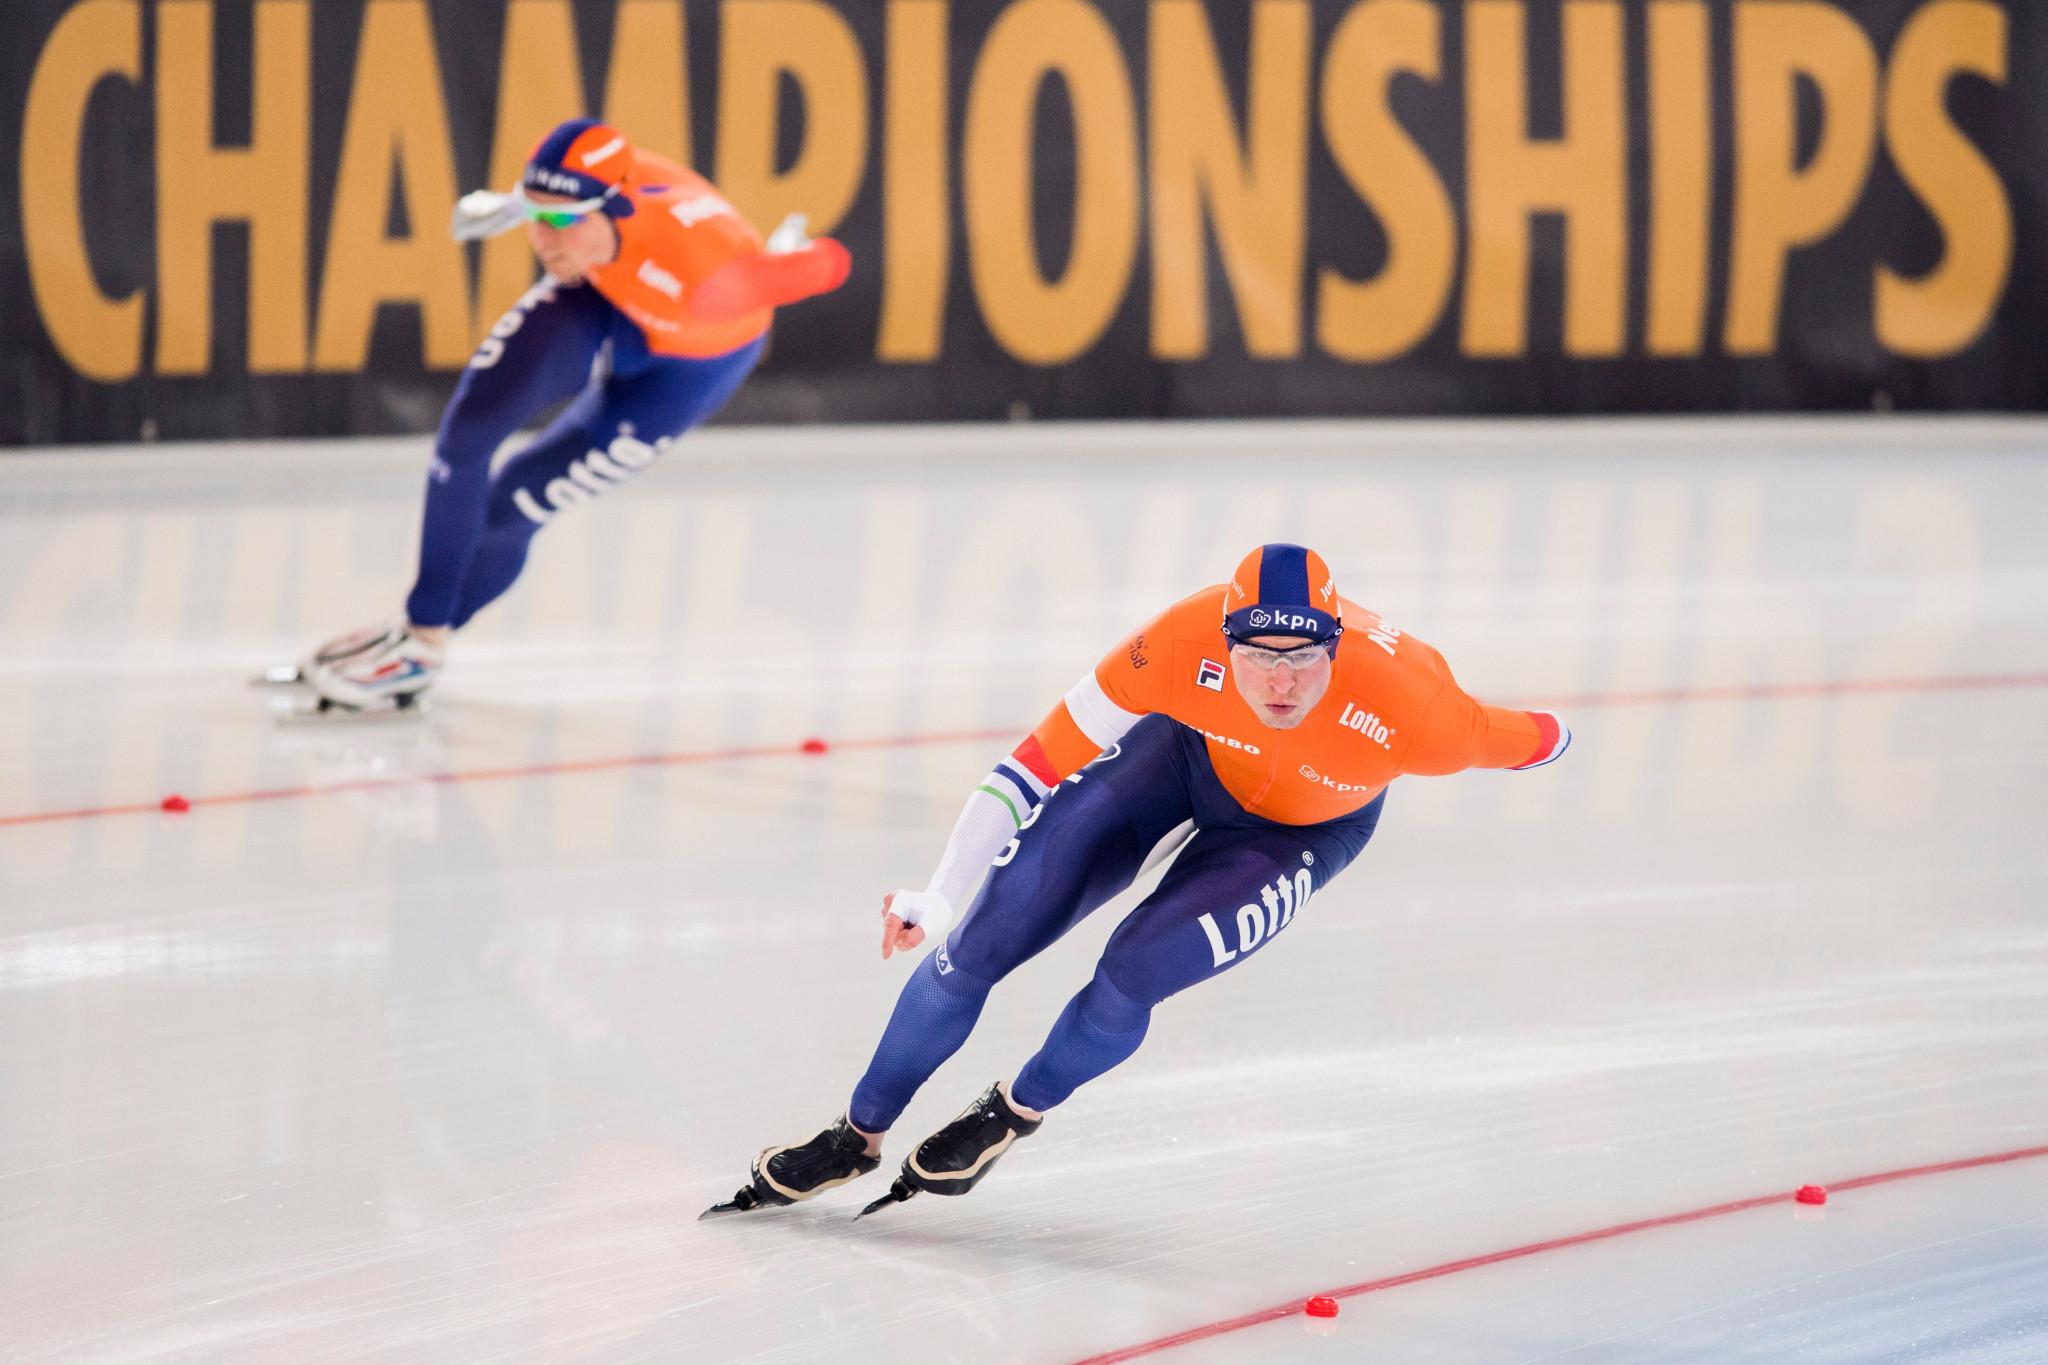 International Skating Union provisionally award three 2022 World Championships